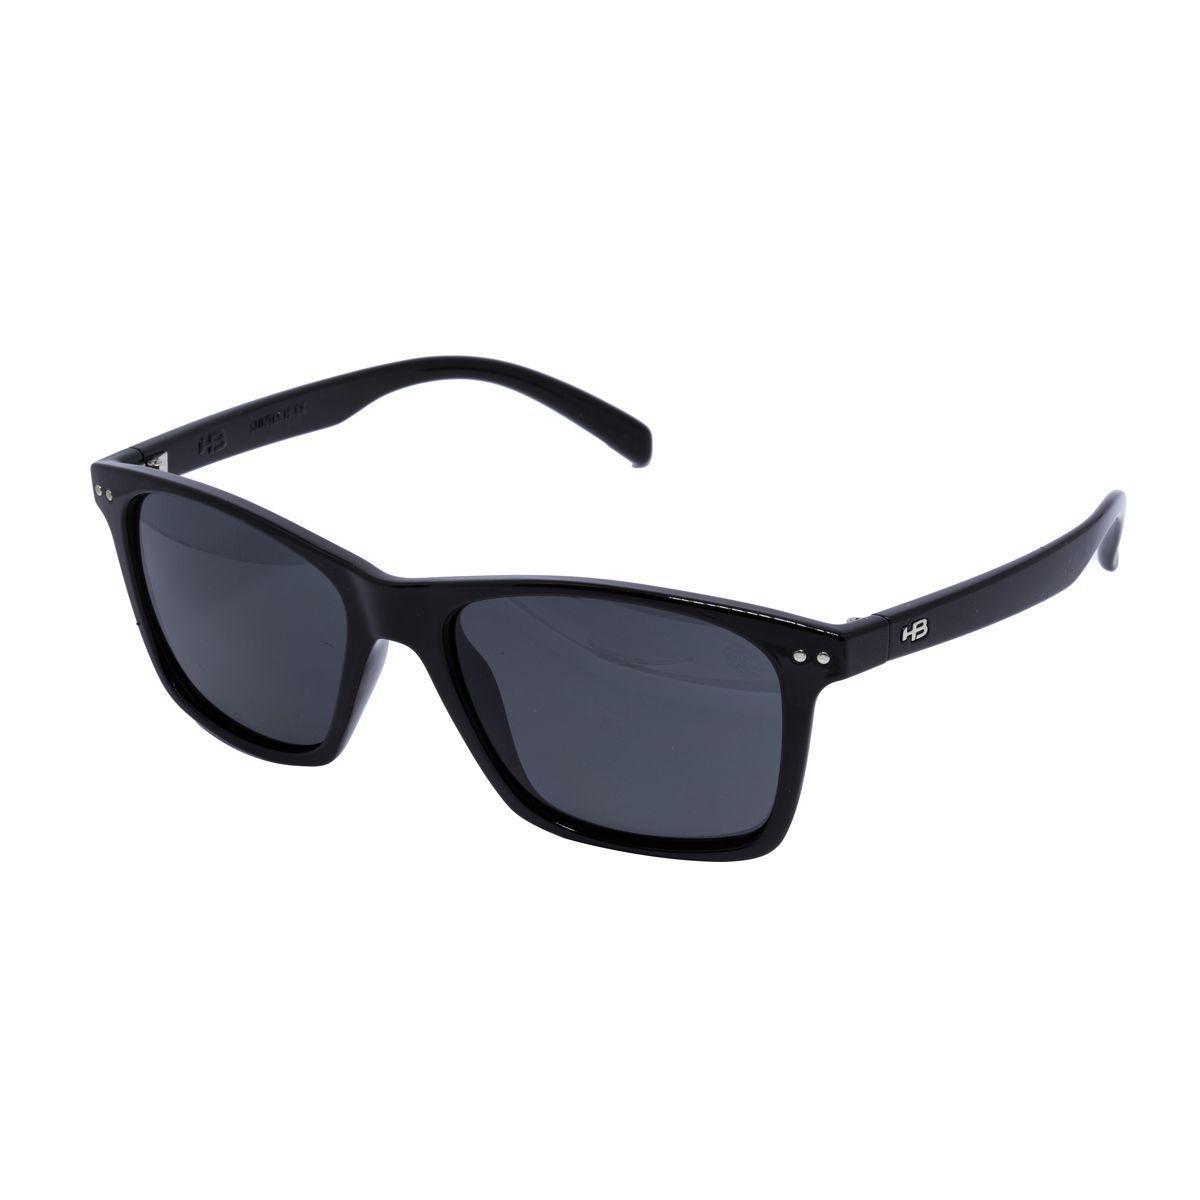 644647820bbd6 Óculos de Sol HB Nevermind Unissex 90105002 - Acetato Preto e Lente Cinza -  Hb - hot butterd R  210,00 à vista. Adicionar à sacola